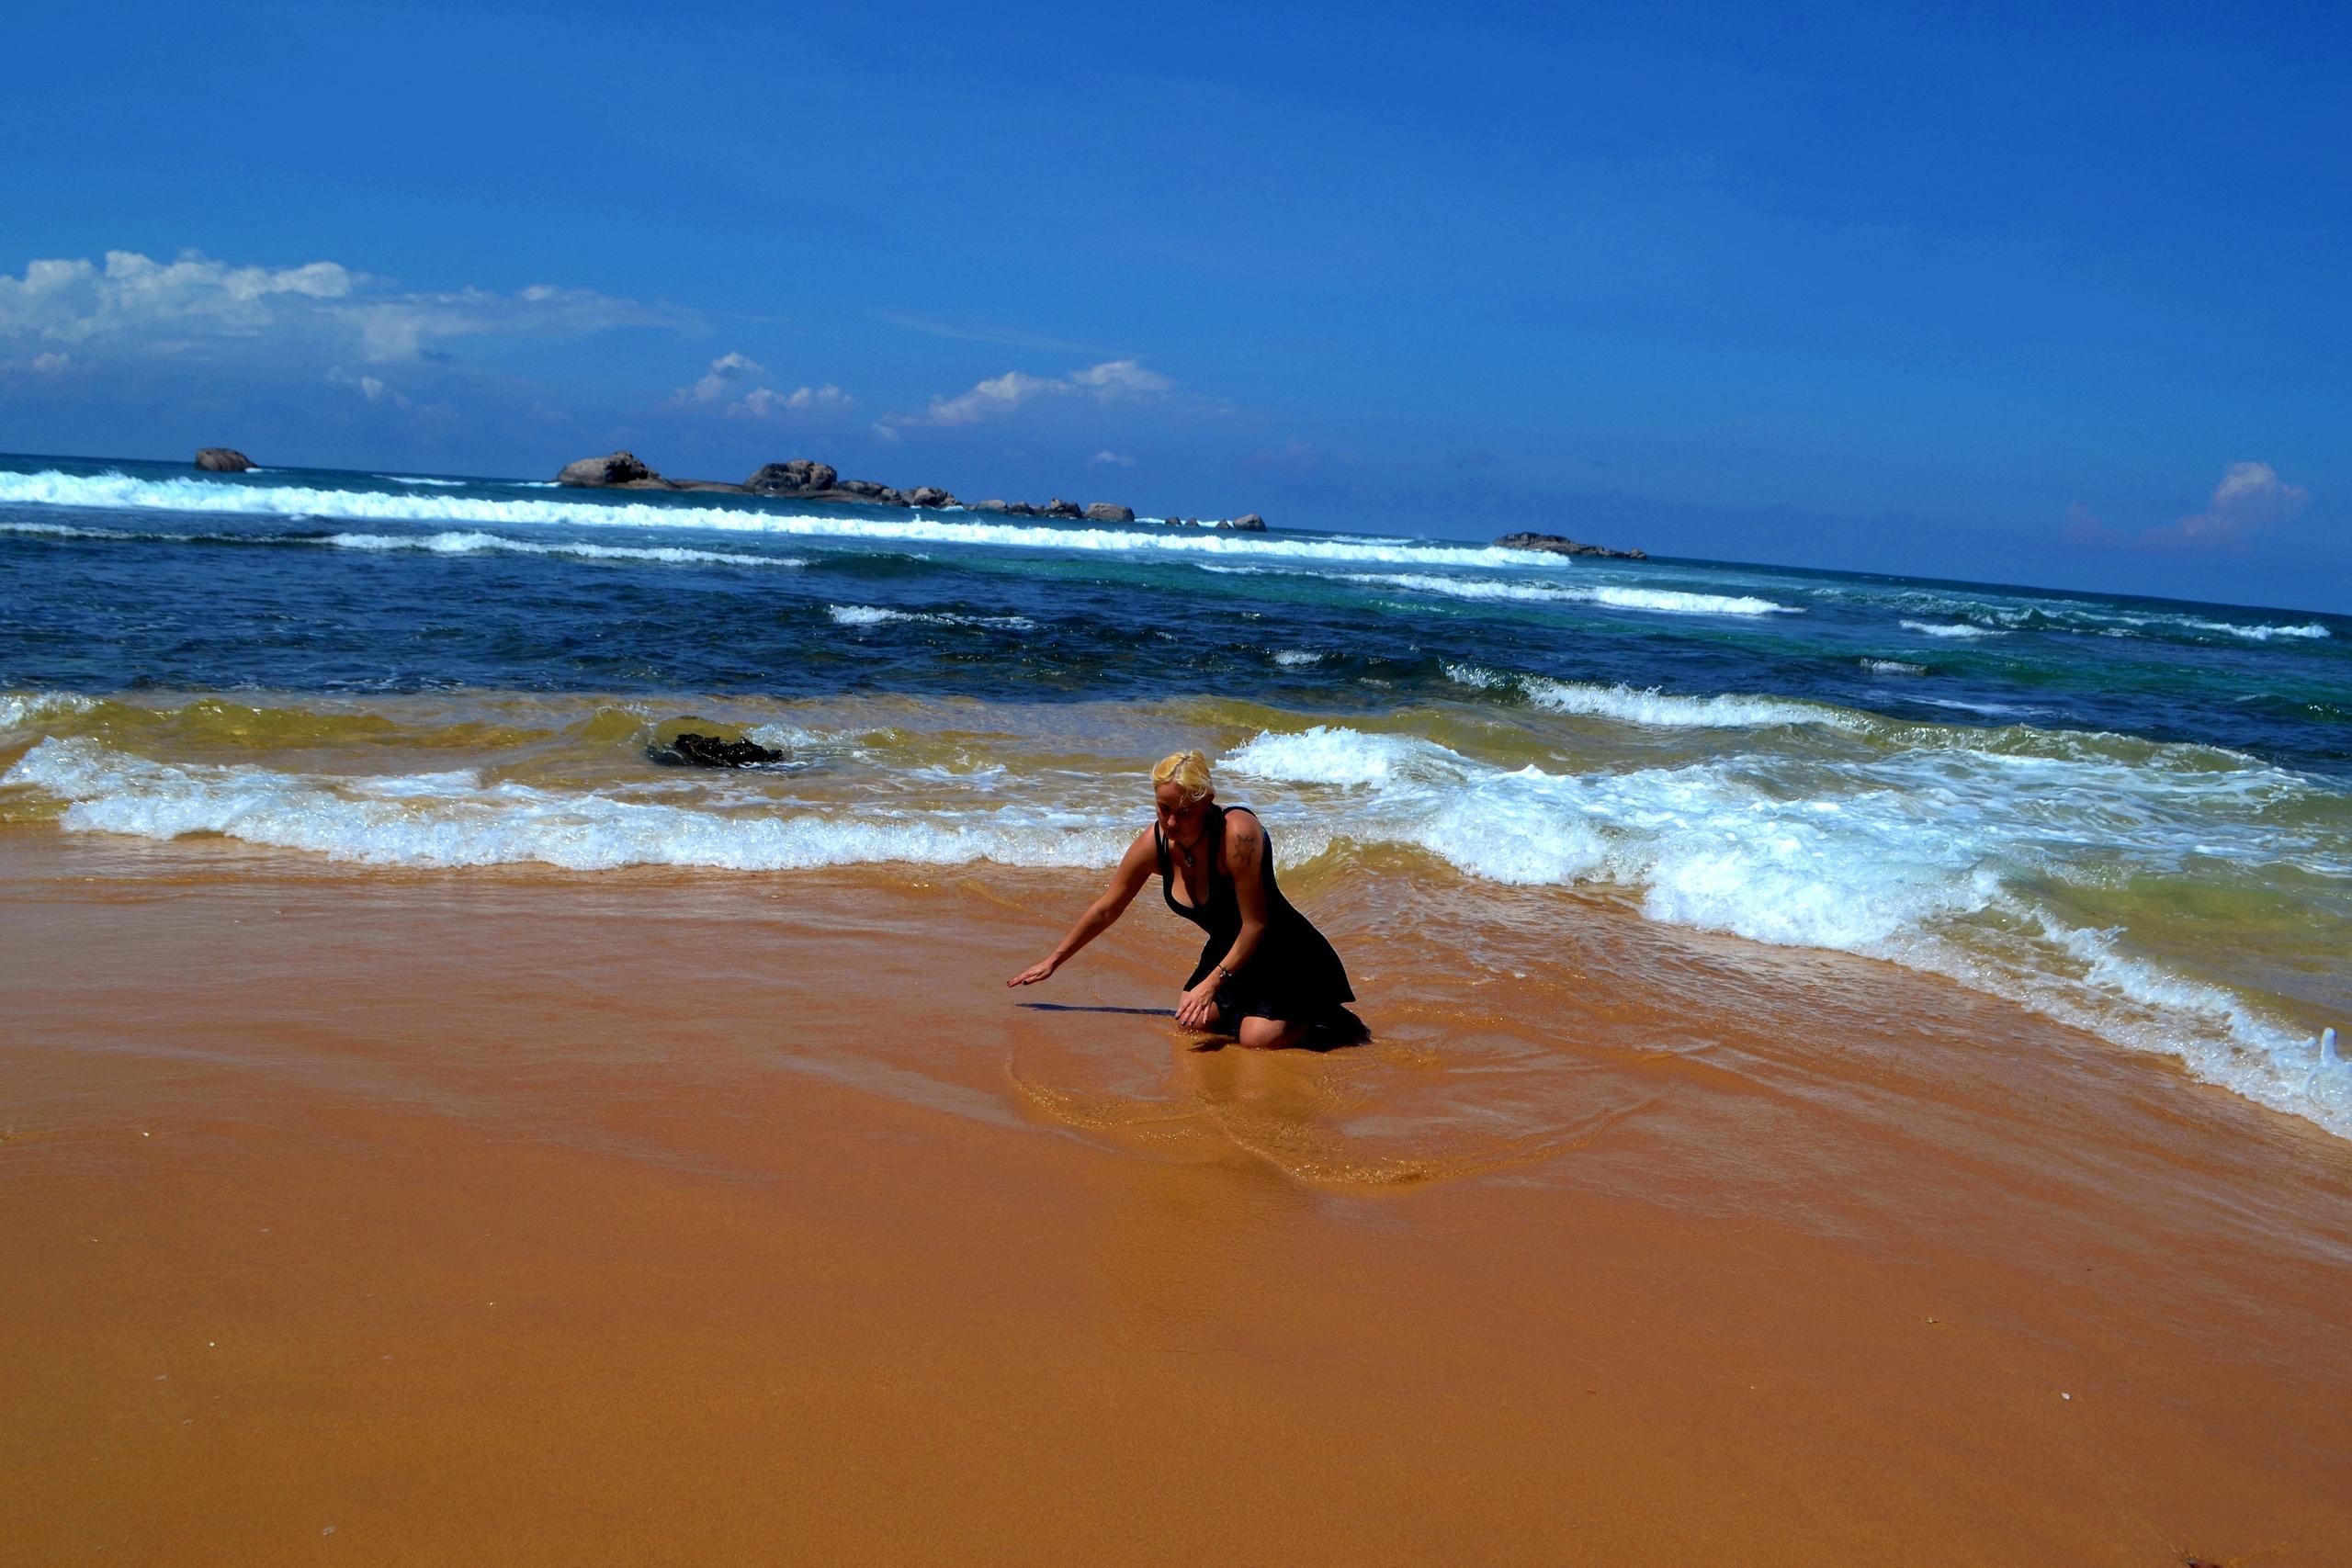 Шри Ланка (фото) OZvxB4N2XEg